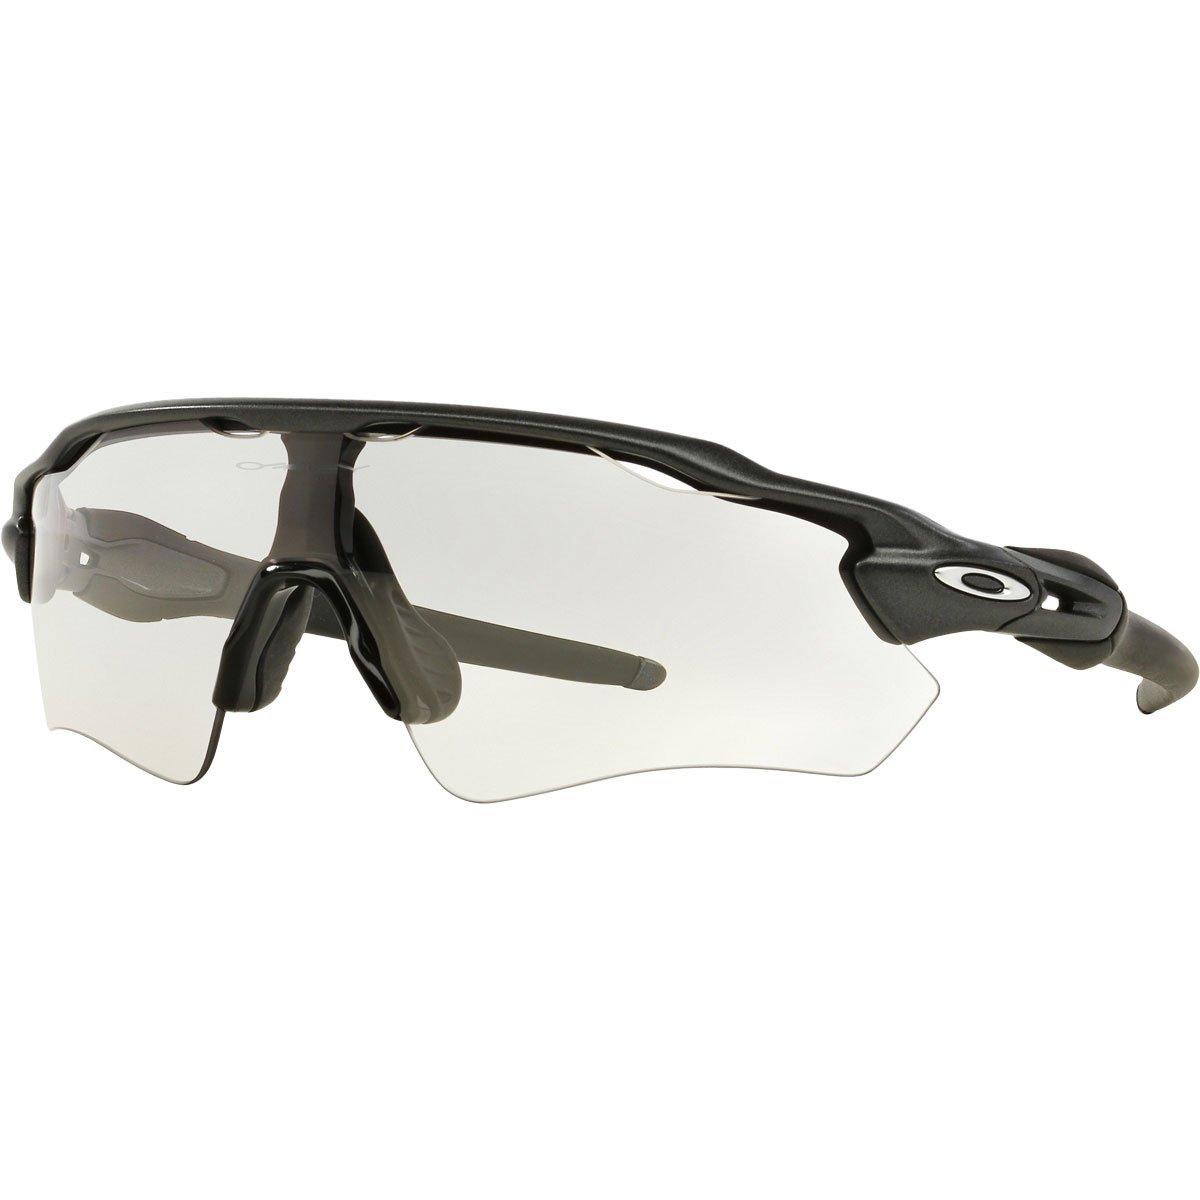 Oakley Men's Radar EV Path OO9208-13 Non-Polarized Iridium Shield Sunglasses, Steel, 138 mm